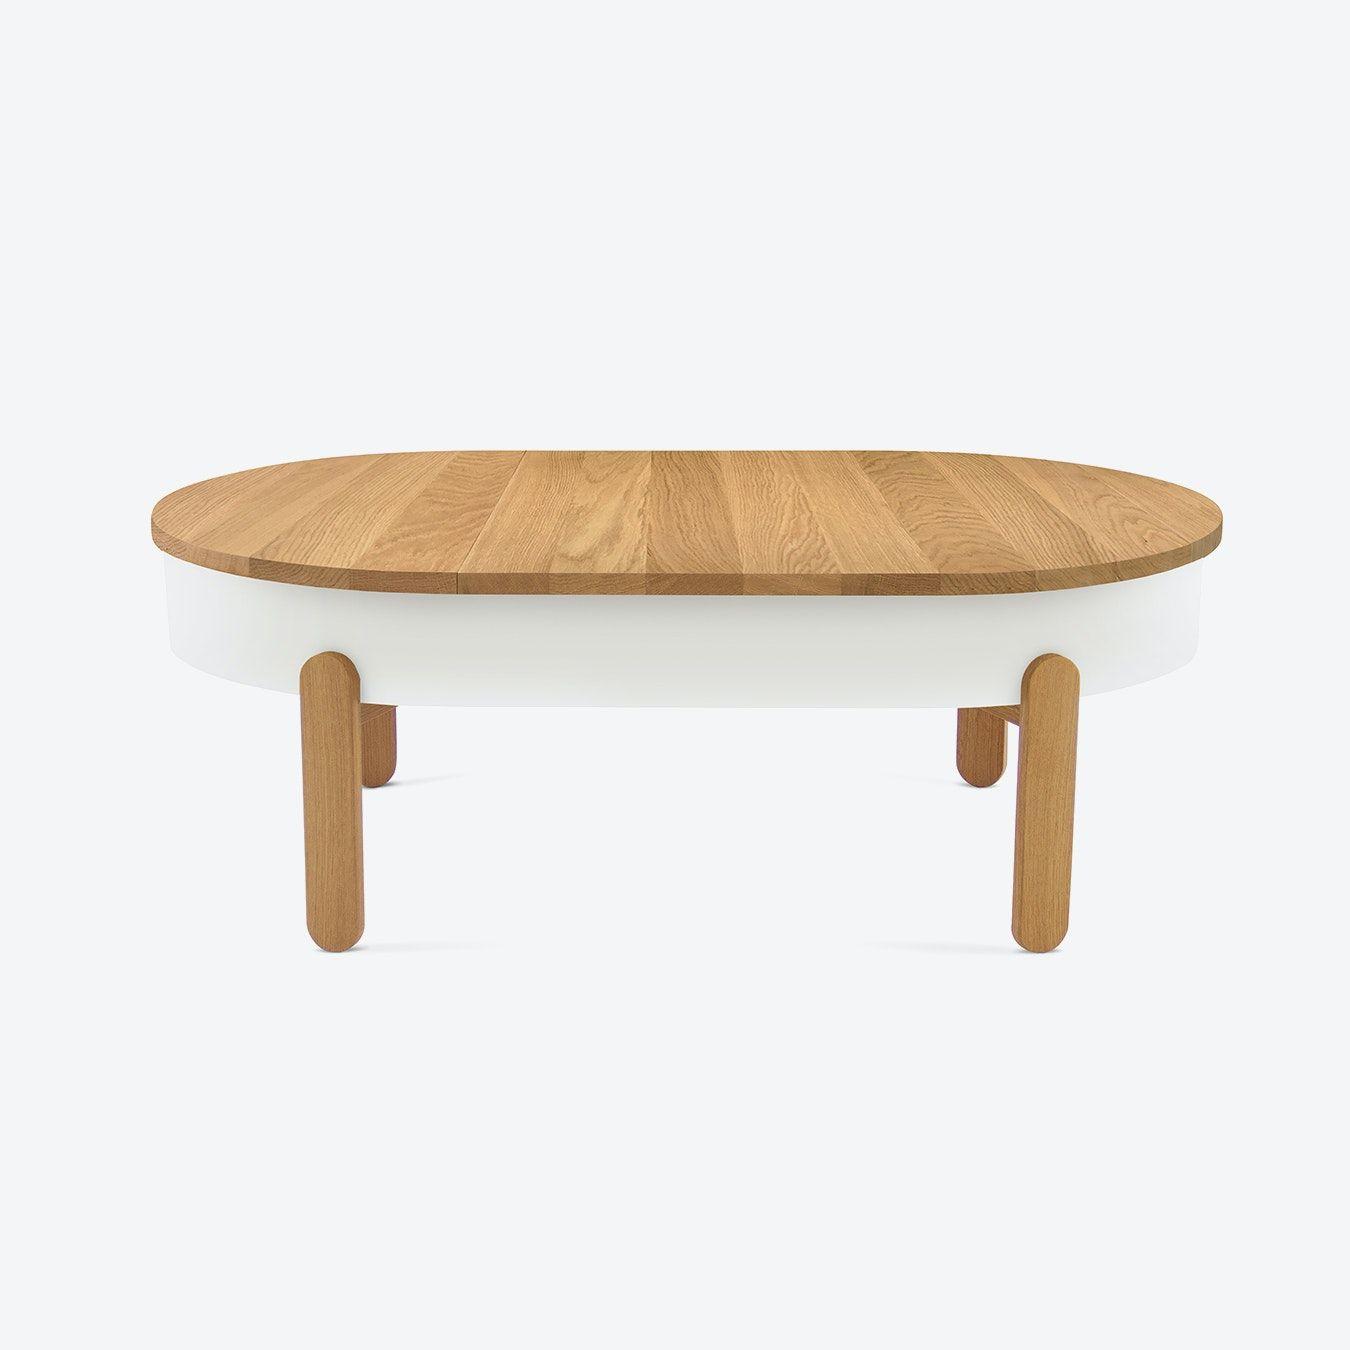 Batea L Coffee Table Oak White Coffee Table Wood Coffee Table Table Top Design [ 1350 x 1350 Pixel ]